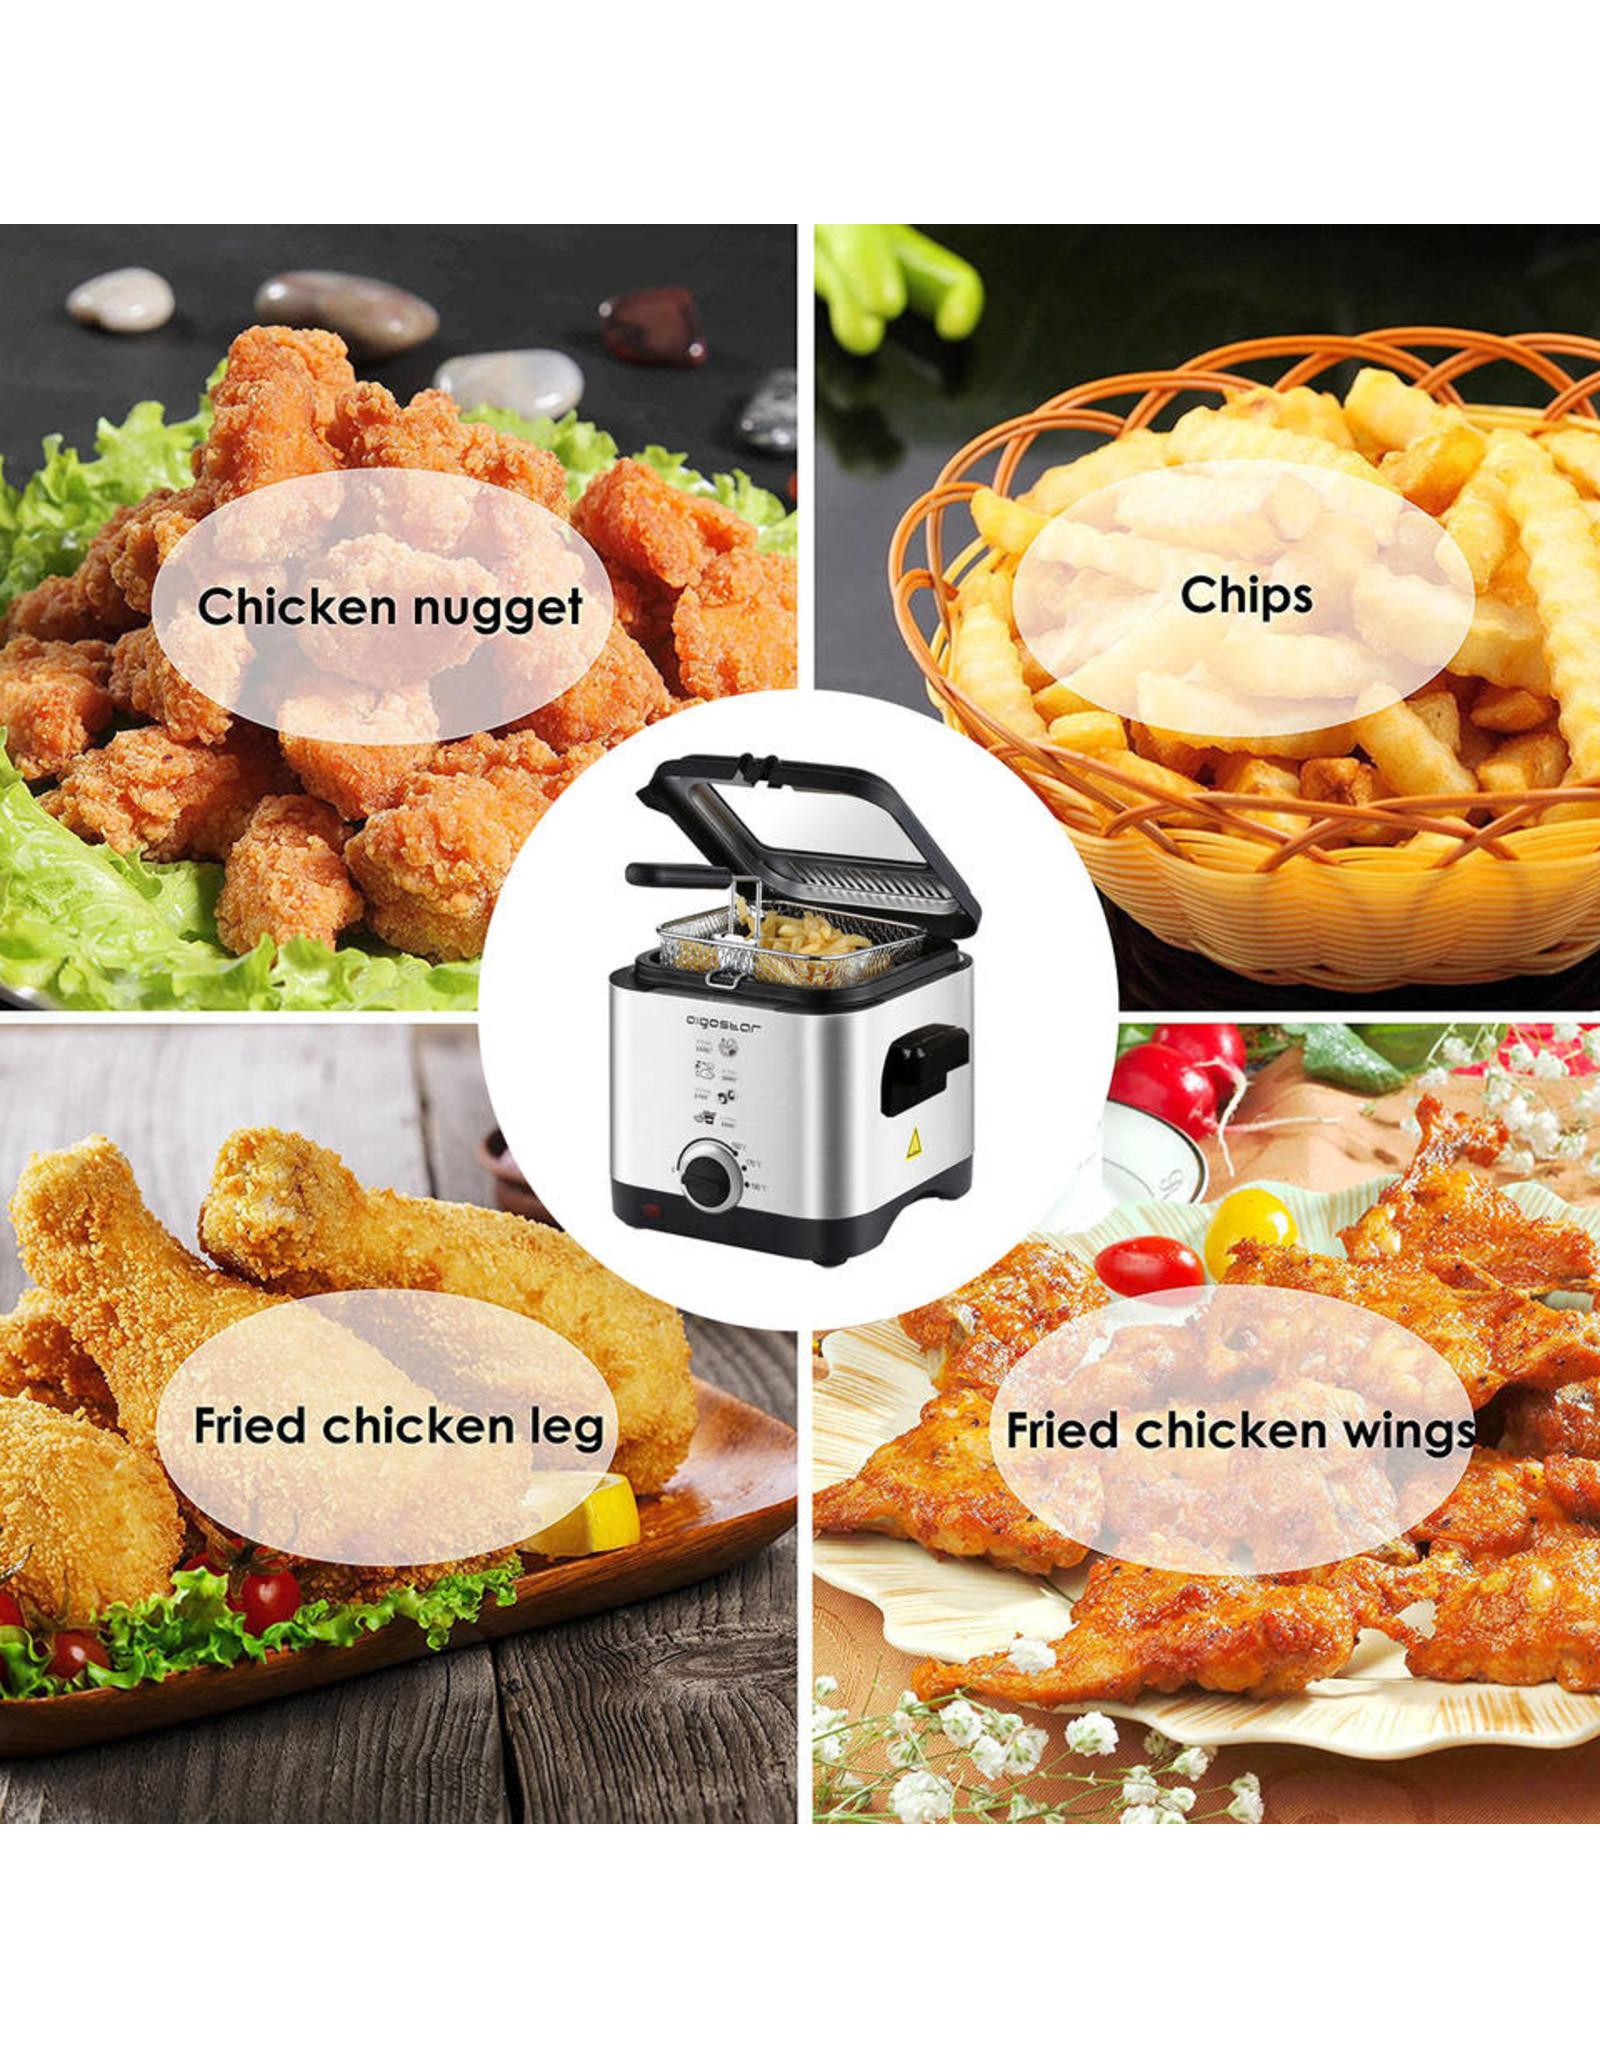 Aigostar fries 30izd - compacte frituurpa/ friteuse n - rvs